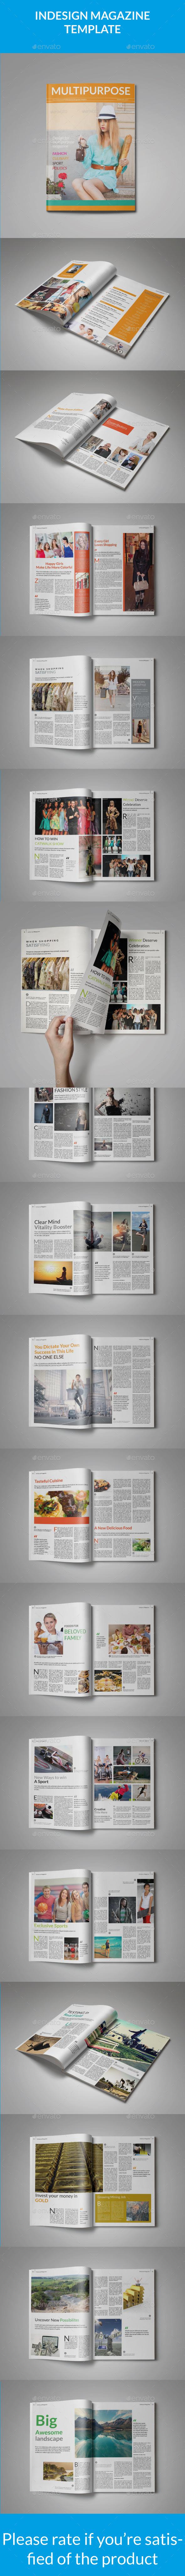 Multi-purpose Magazine - Magazines Print Templates